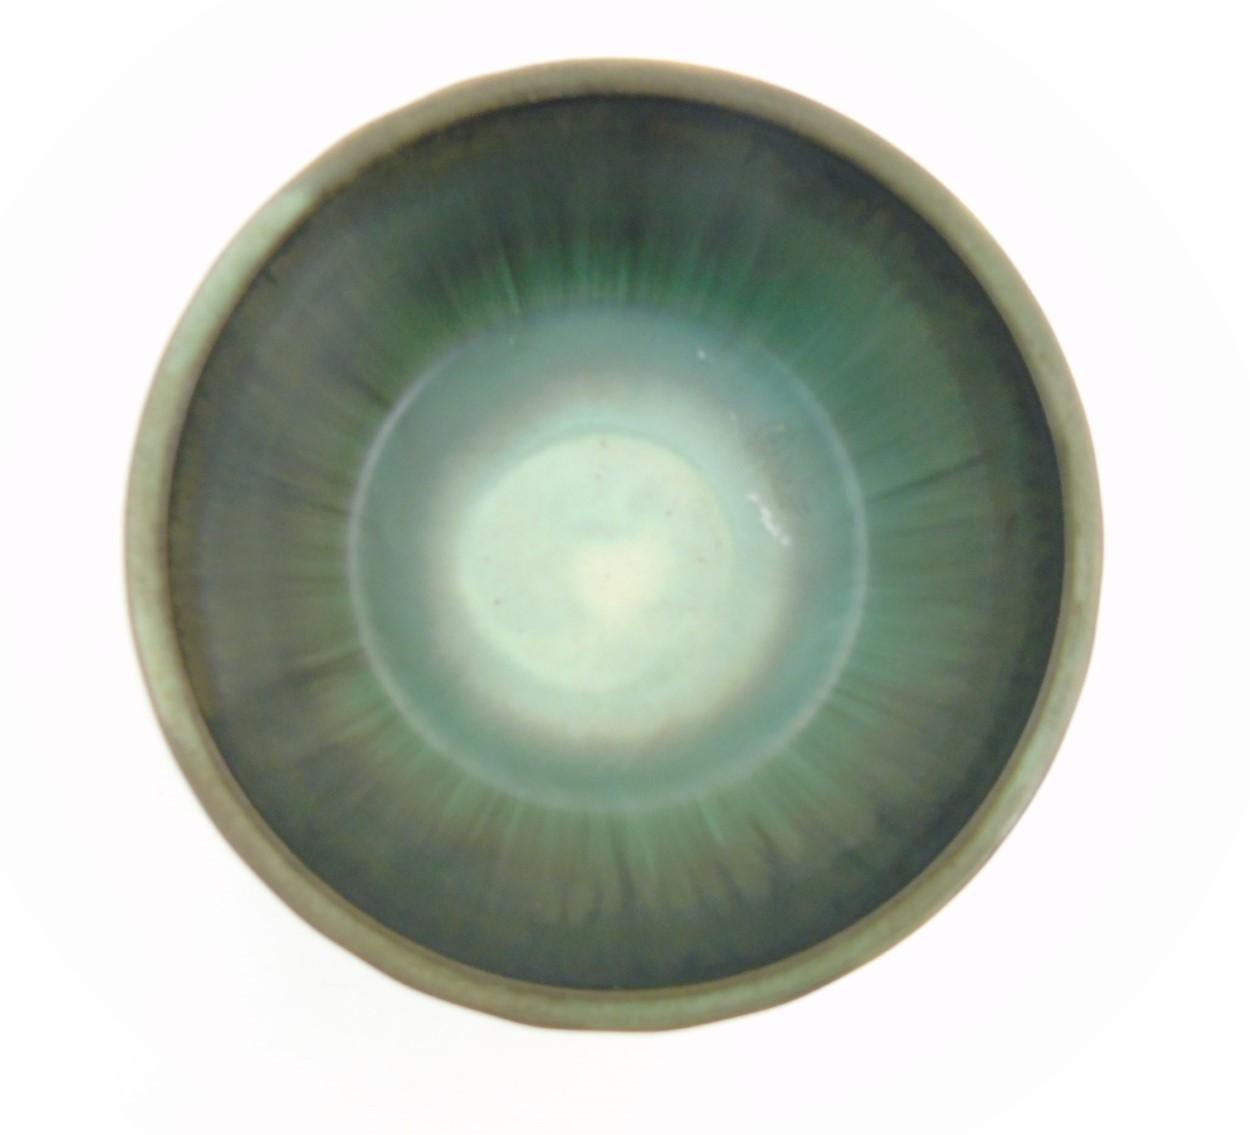 Lot 83 - Scandinavian Studio Pottery: A Swedish bowl with green interior by Tilgmans Keramik, Sweden,